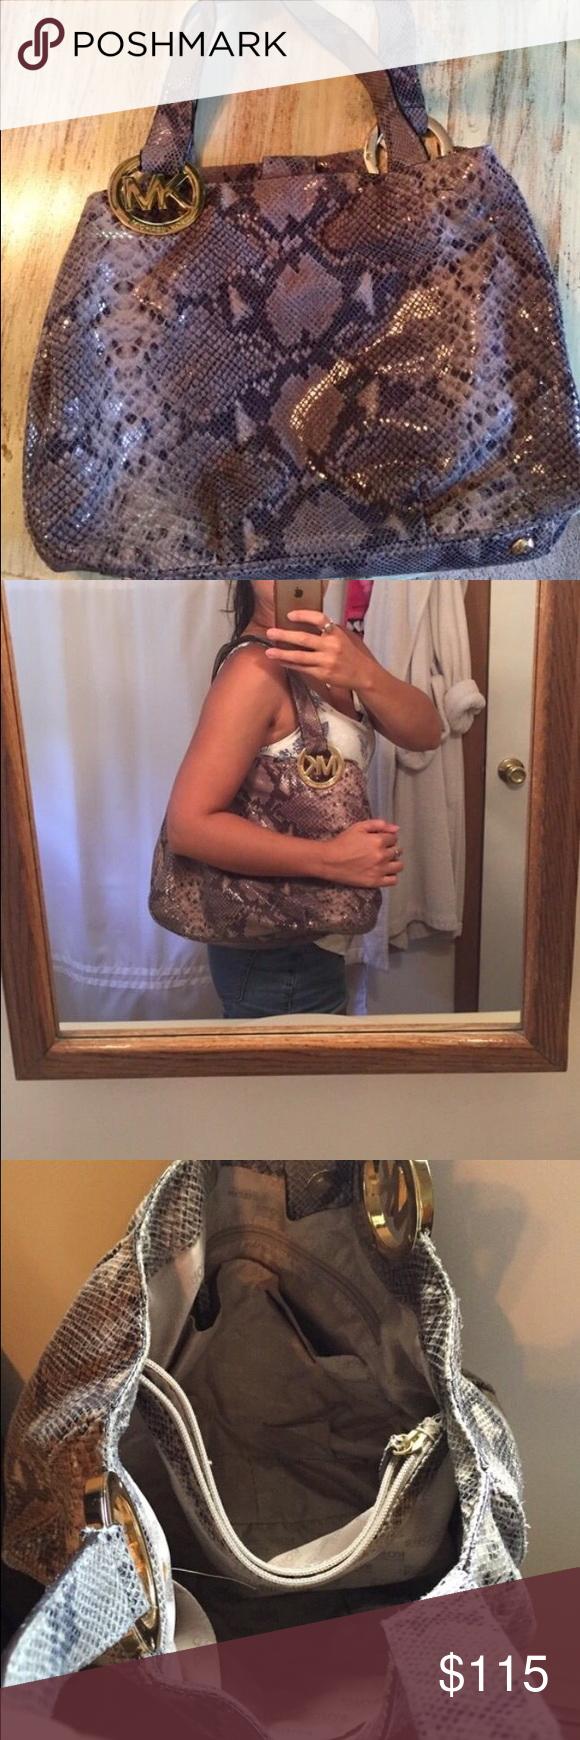 Snake skin Michael Kors bag Good condition Mk bag, lots of space.  small wear mark on strap Michael Kors Bags Shoulder Bags